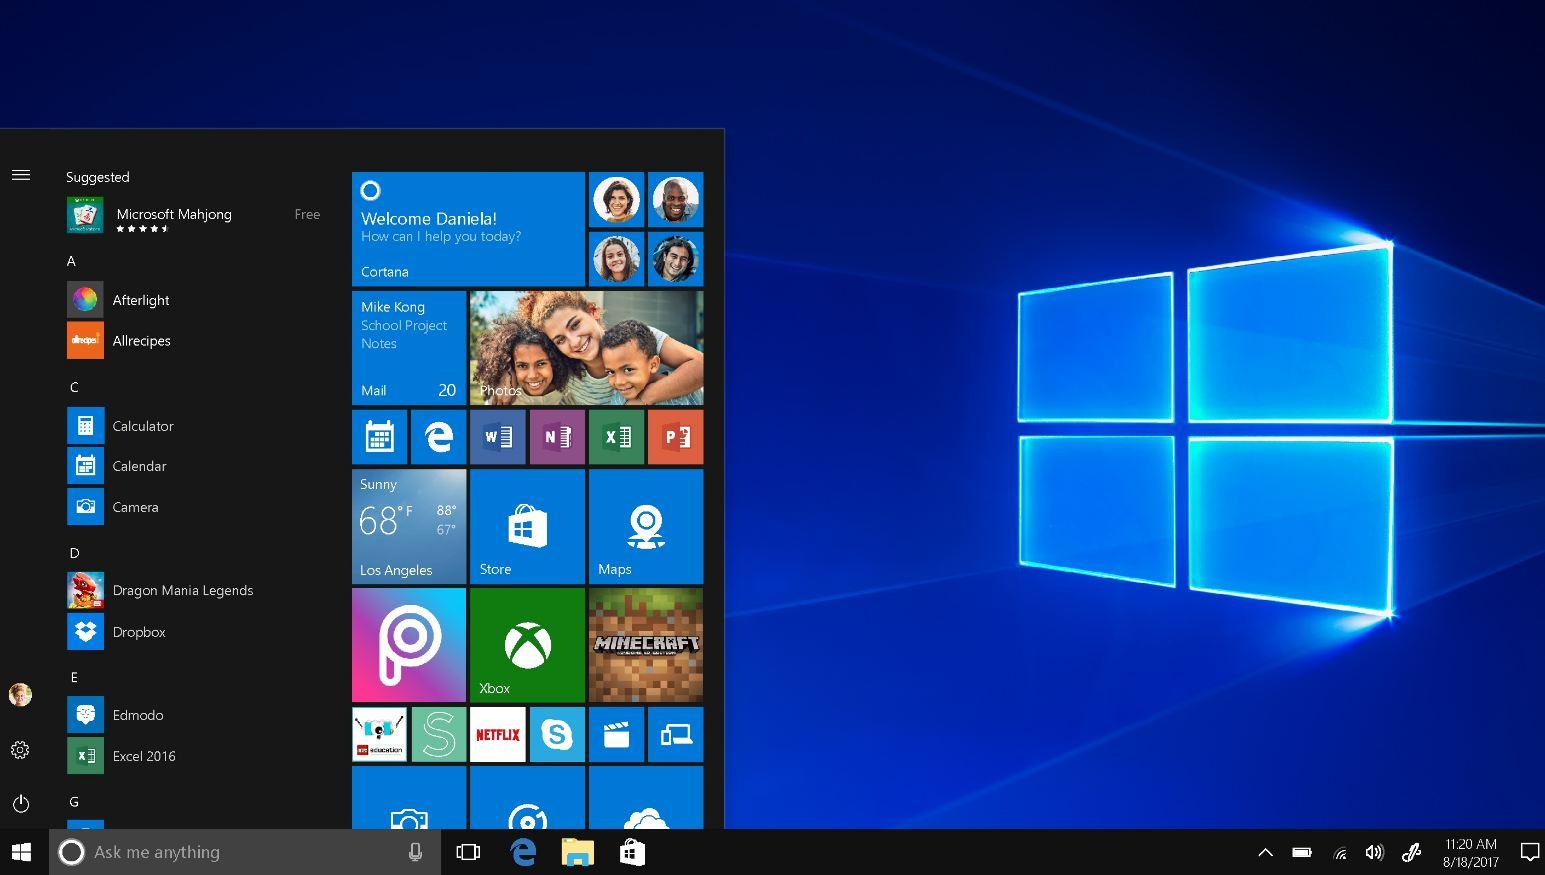 Windows 10 S launches through Surface Laptop